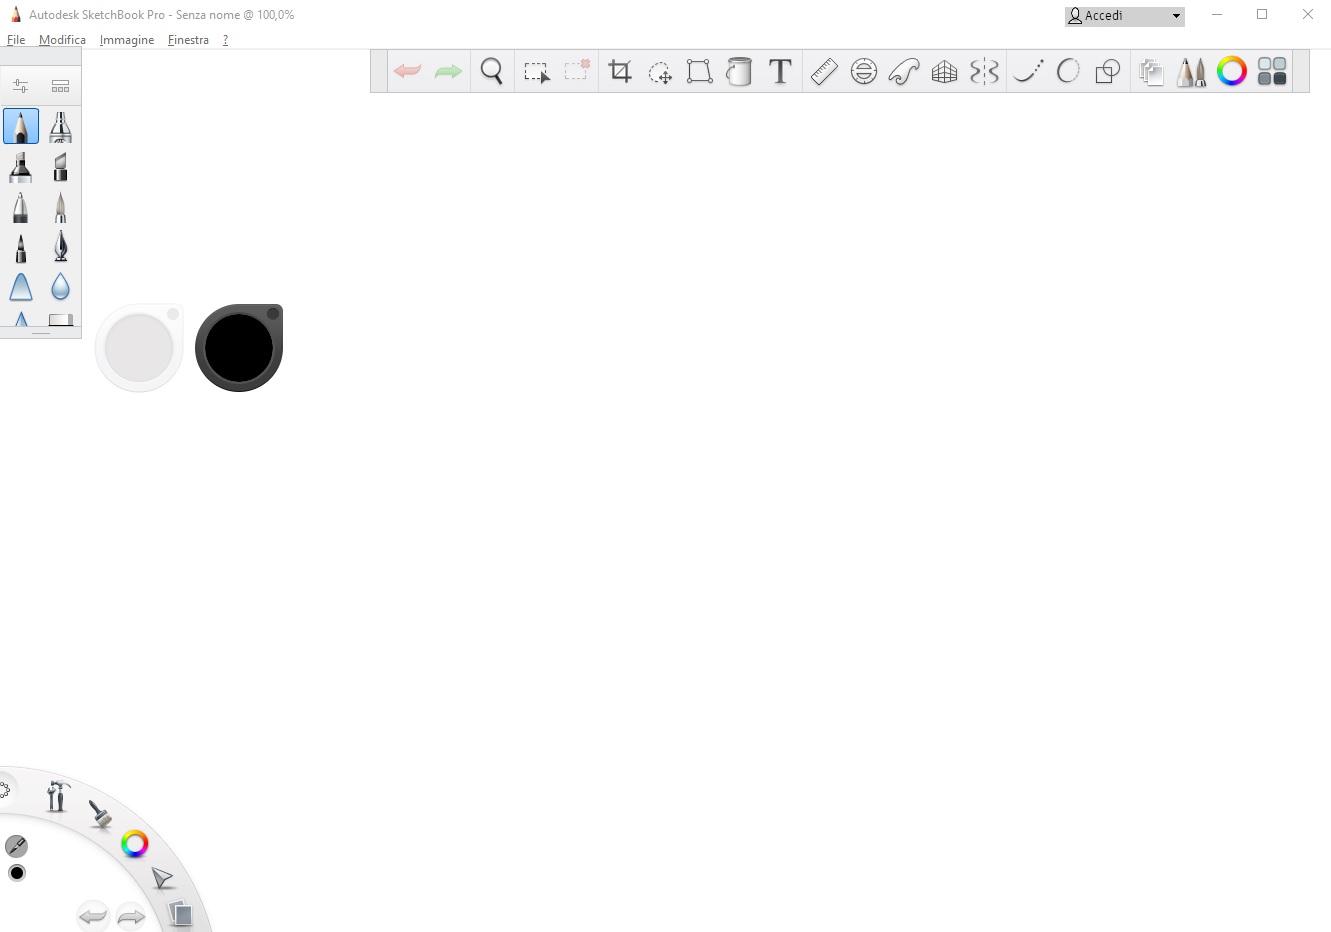 Autodesk SketchBook Pro 2020.1 v8.6.6 x64 - ITA